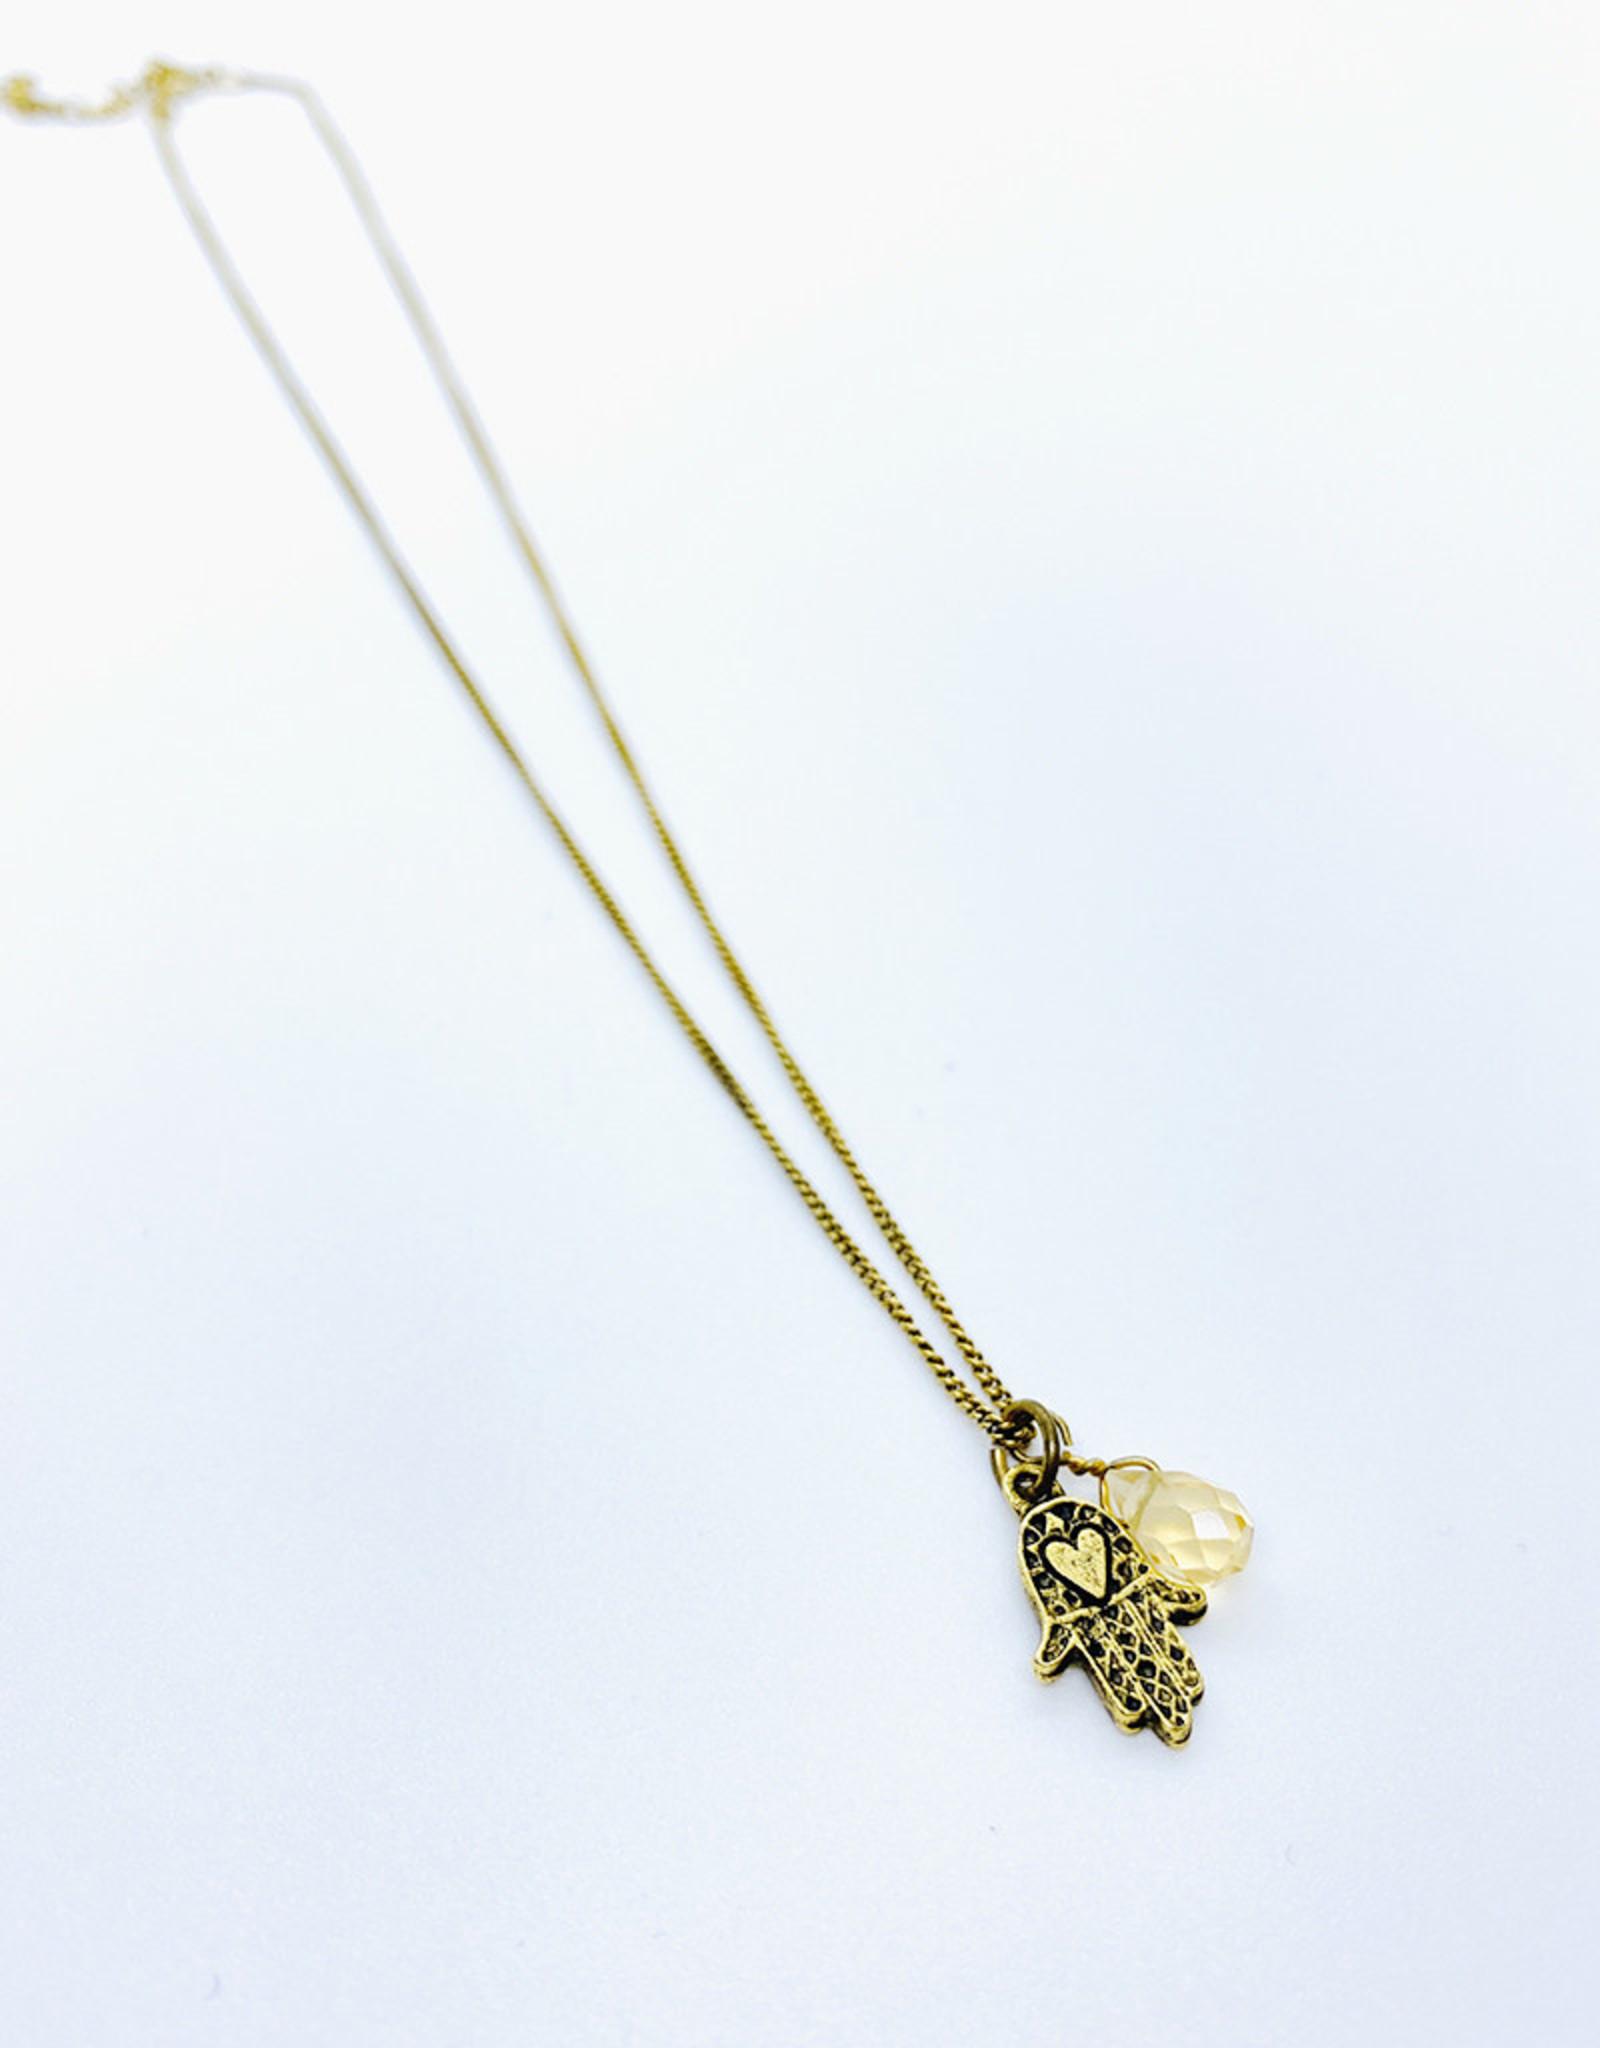 Tilly Doro Hamsa + Stone Necklace // Tillydoro